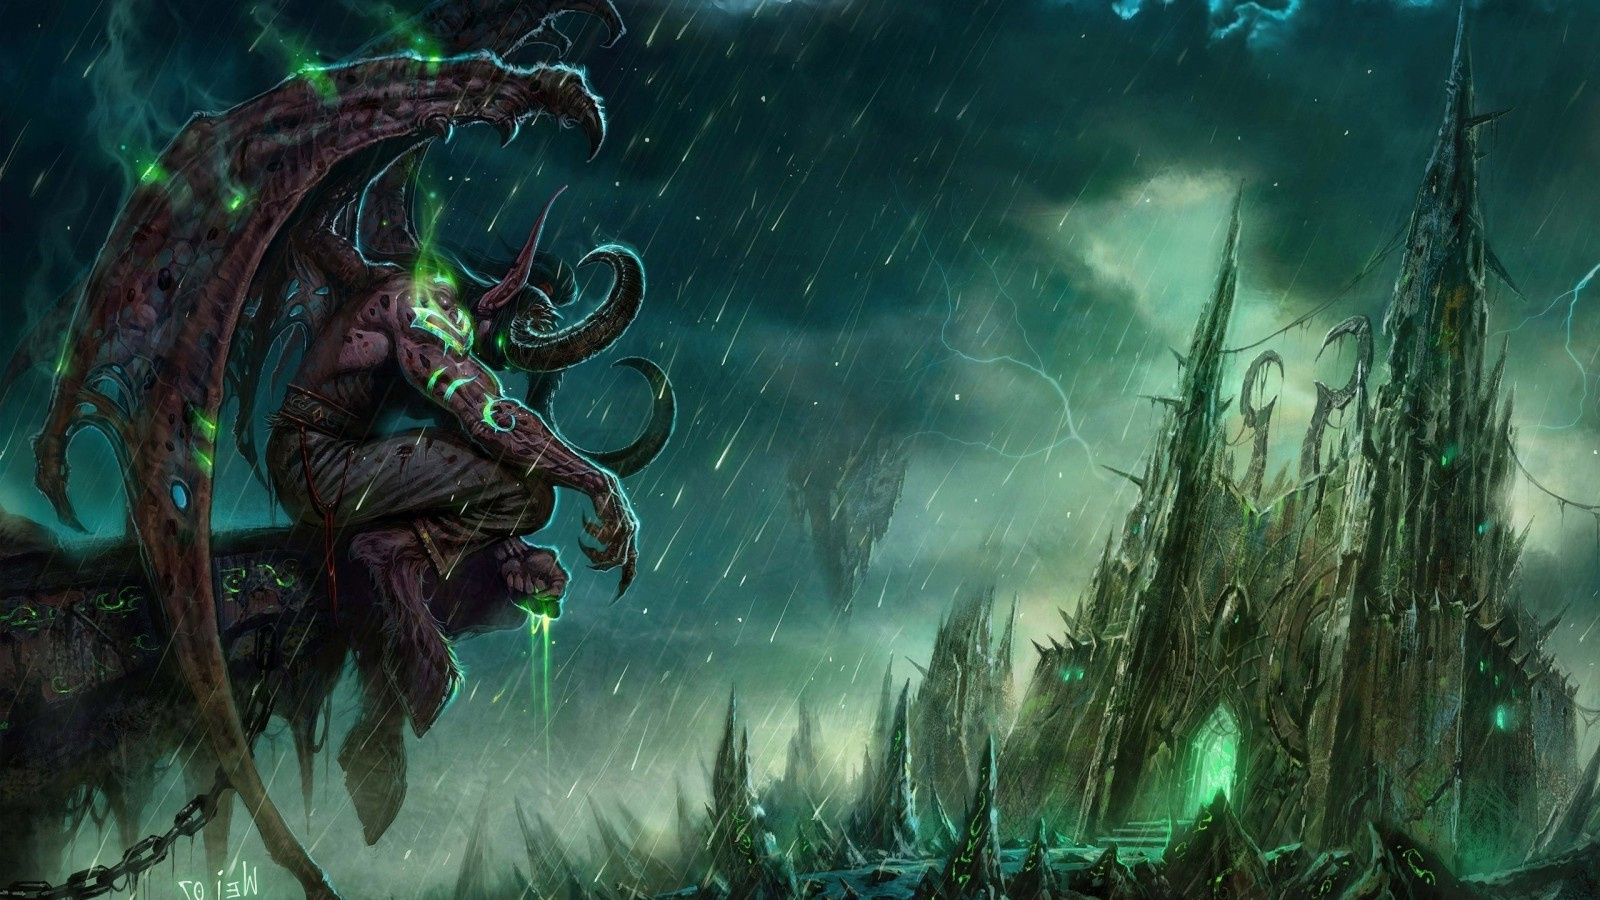 По слухам, Blizzard готовит дополнение The Burning Crusade для WoW Classic